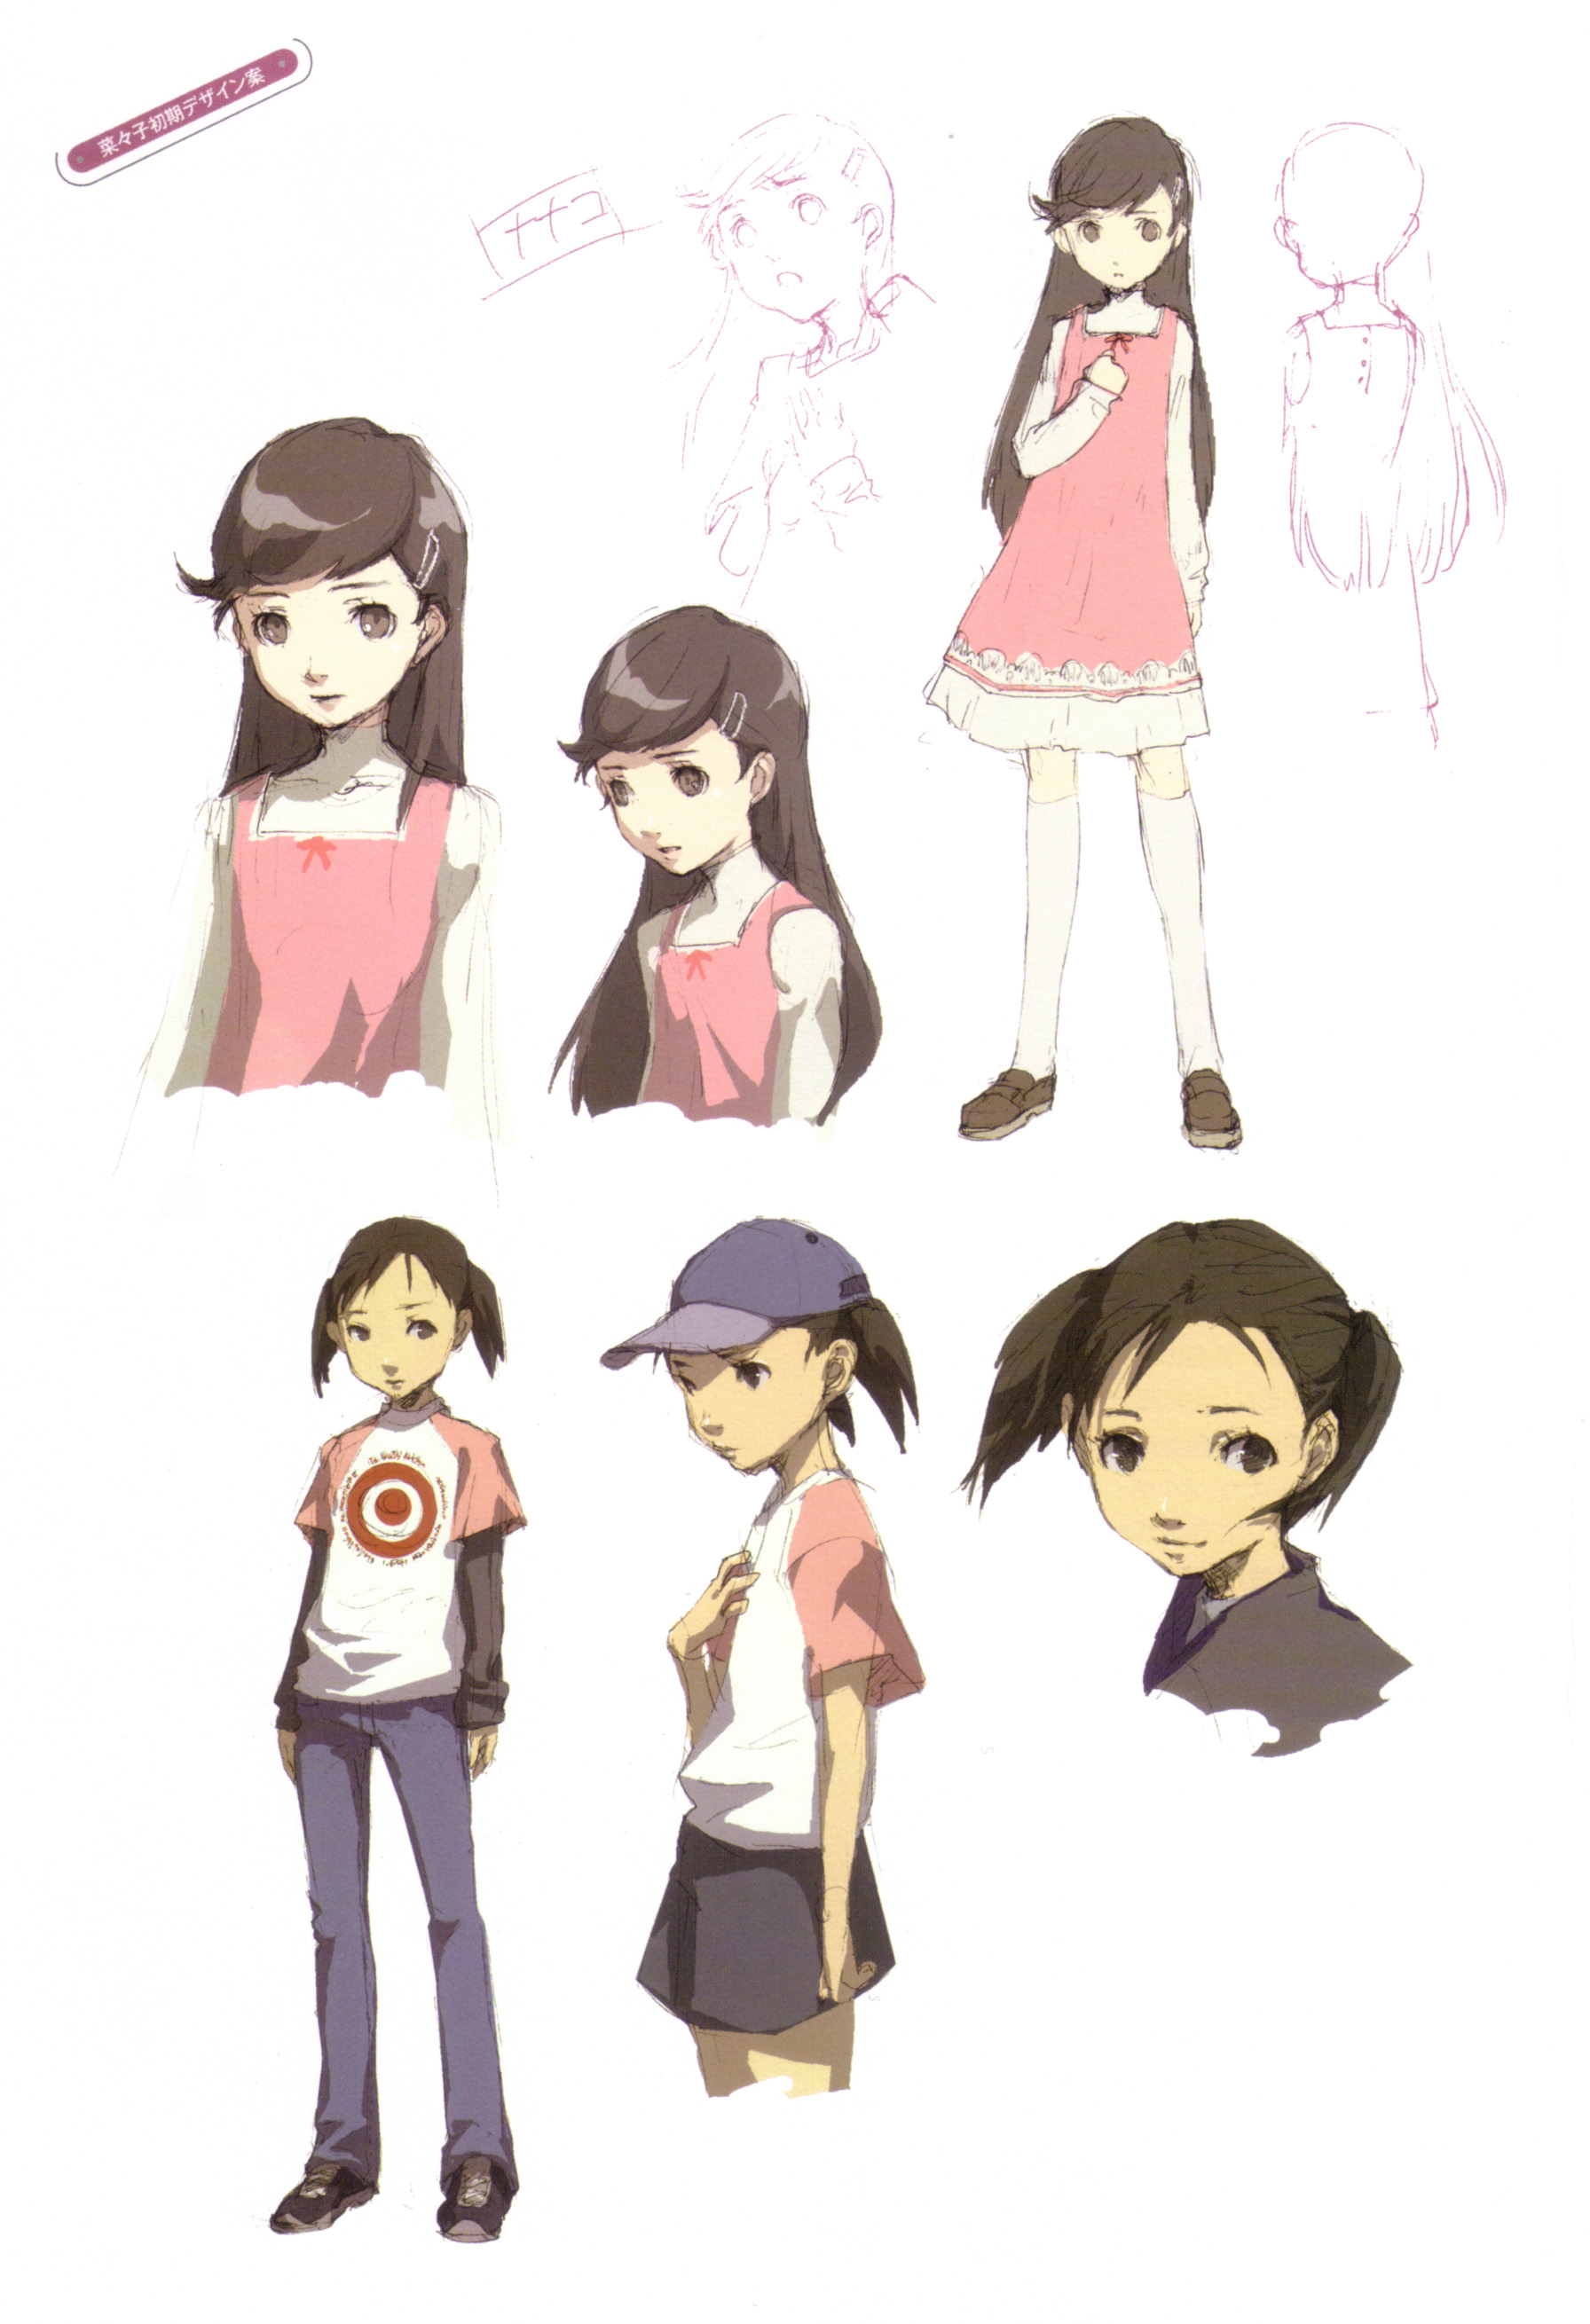 Persona 4 golden help nanako with homework